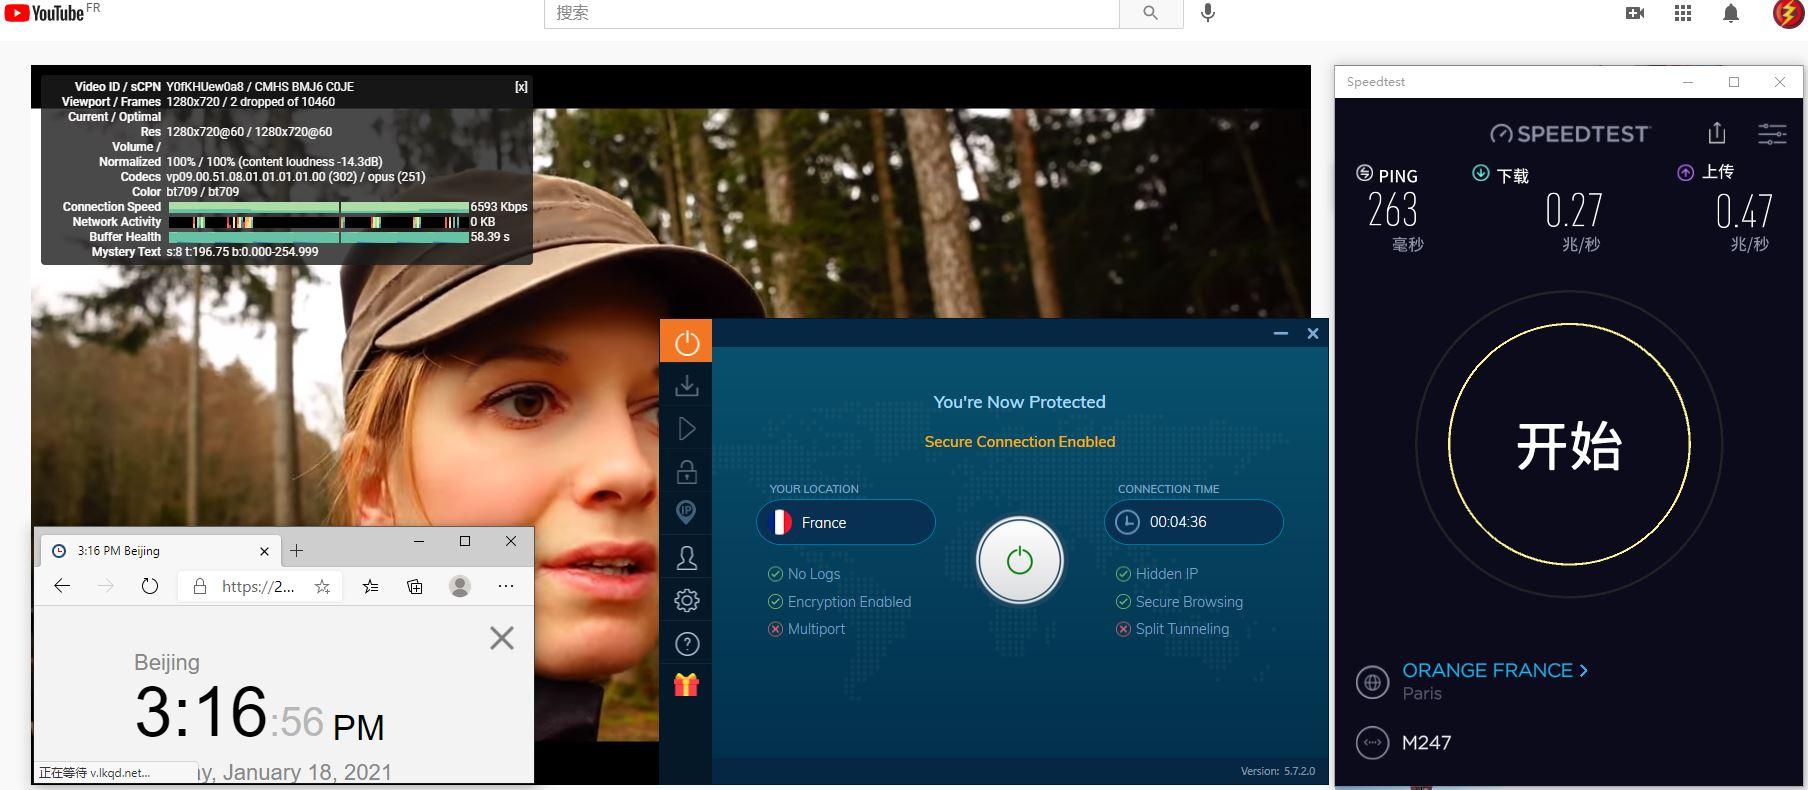 Windows10 IvacyVPN IKEv2 France 服务器 中国VPN 翻墙 科学上网 10BEASTS Barry测试 - 20210118